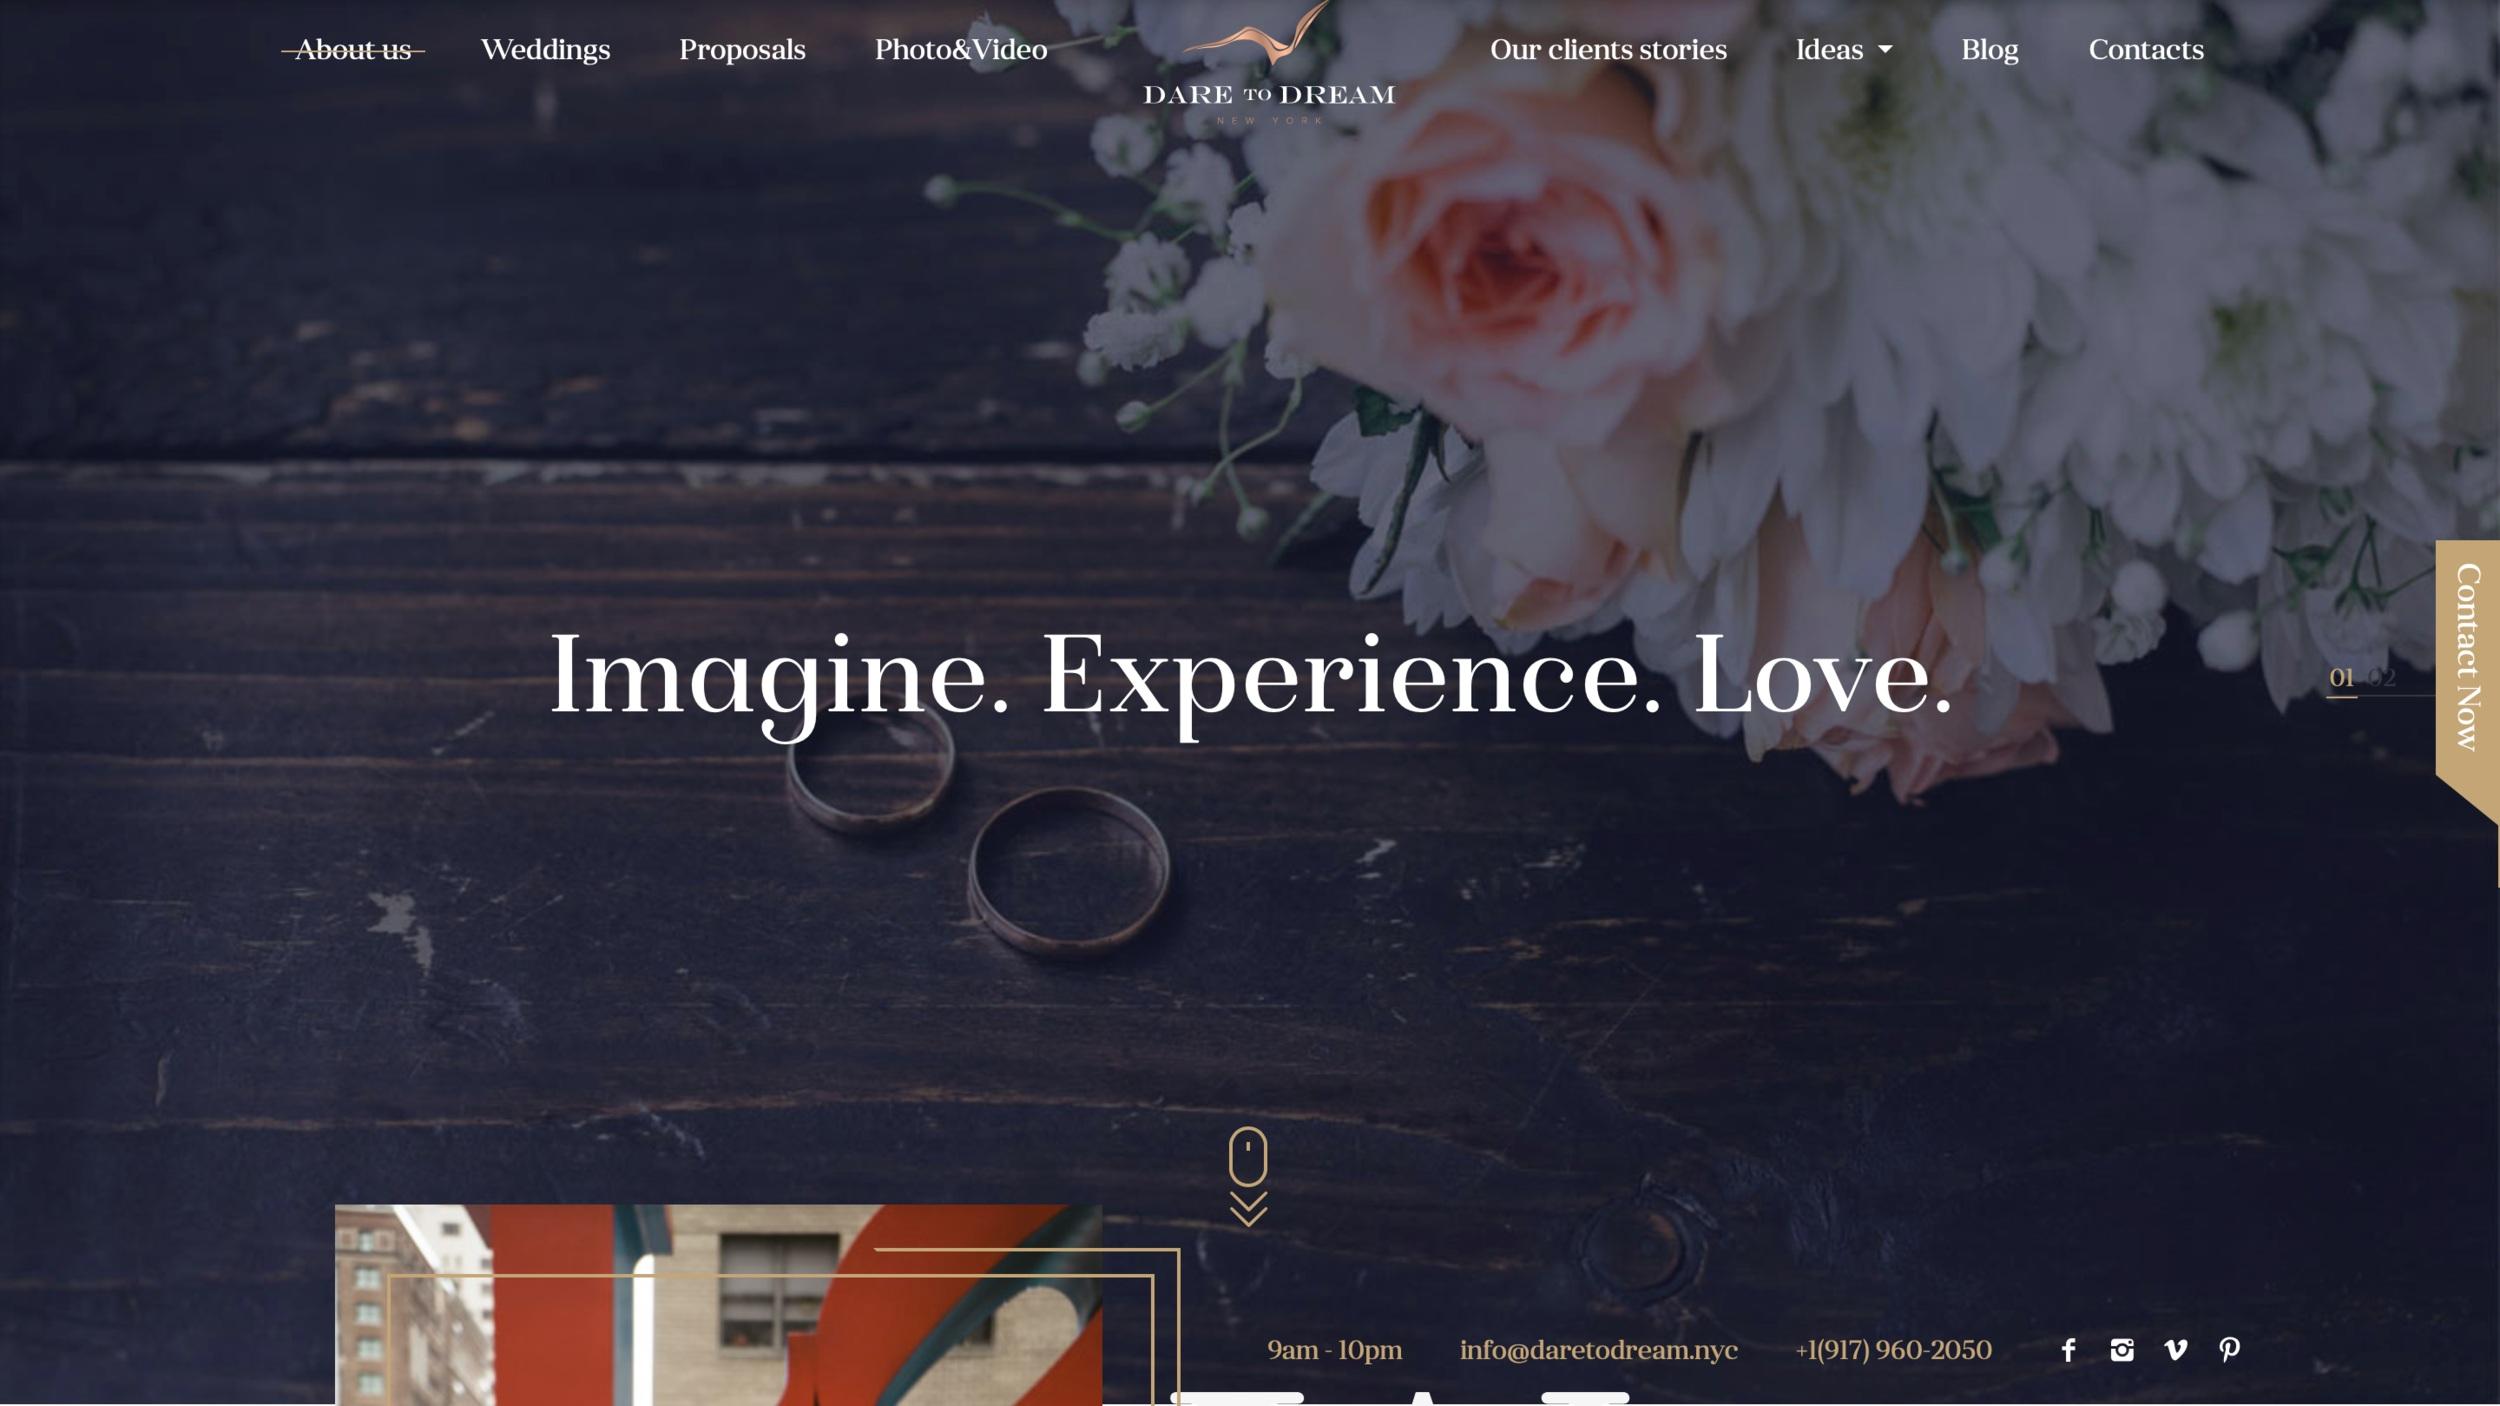 Wedding industry's best web design & marketing agency.